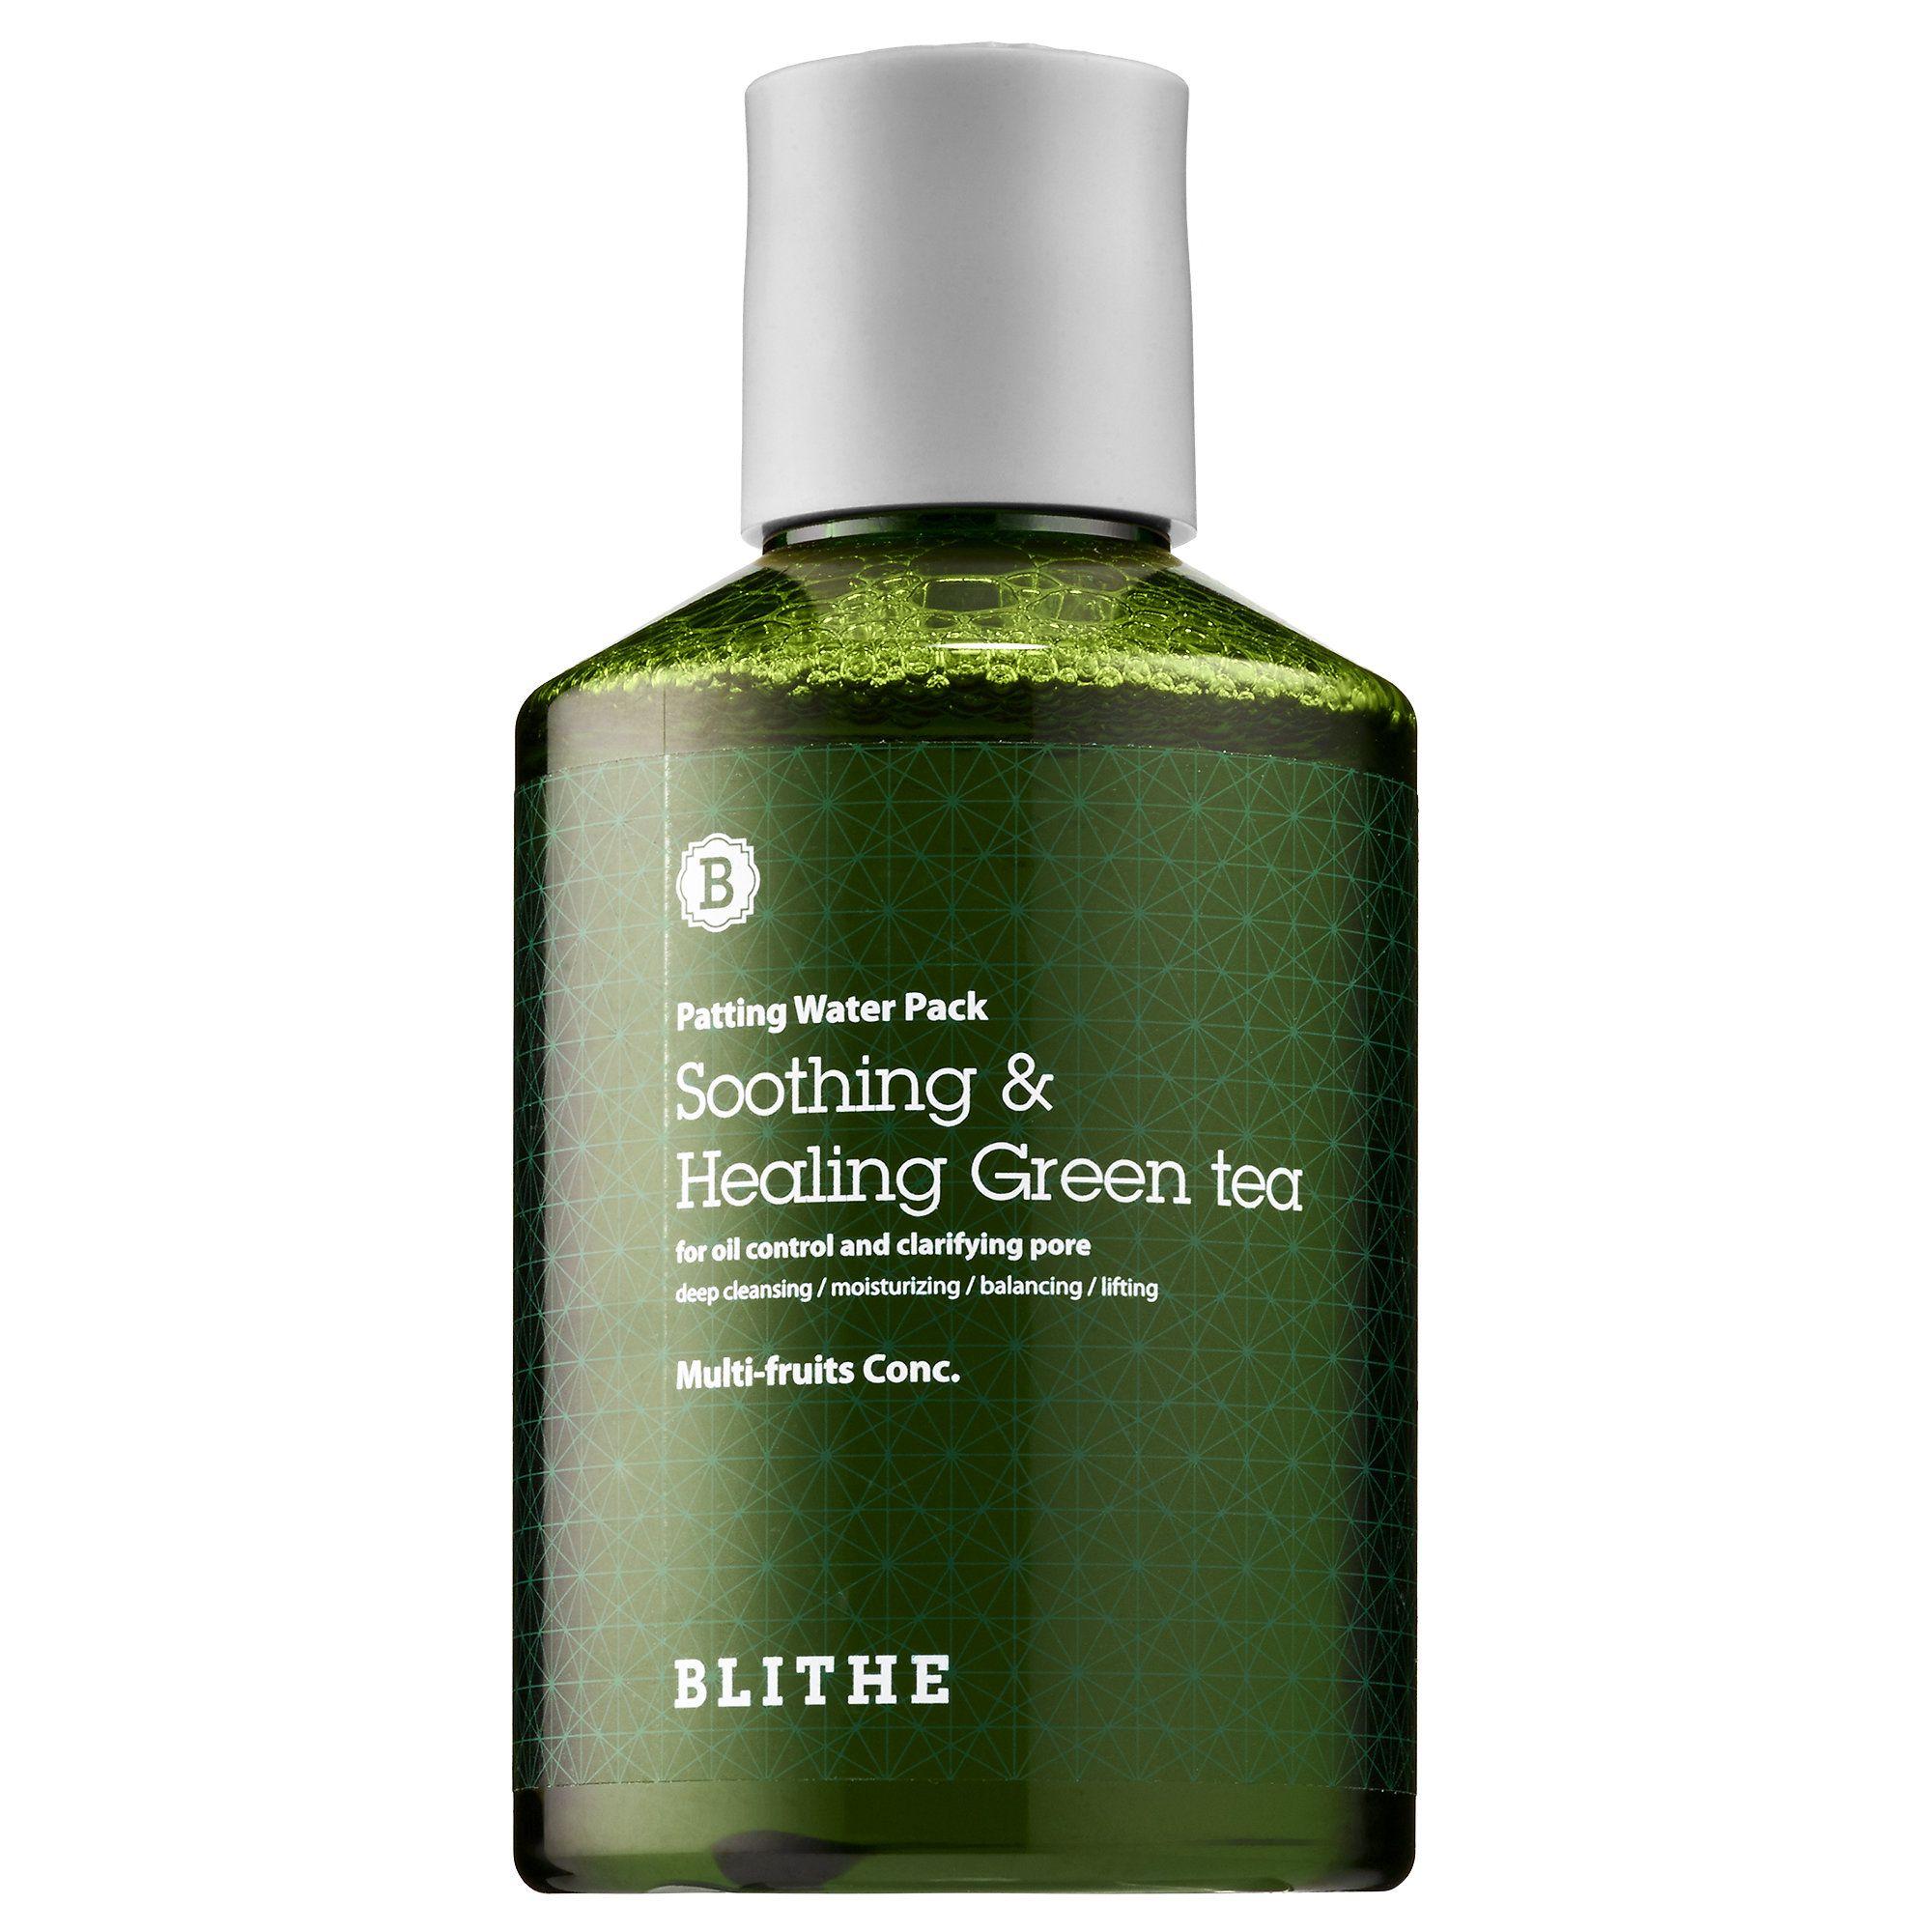 Shop Blithe's Soothing & Healing Green Tea Splash Mask at